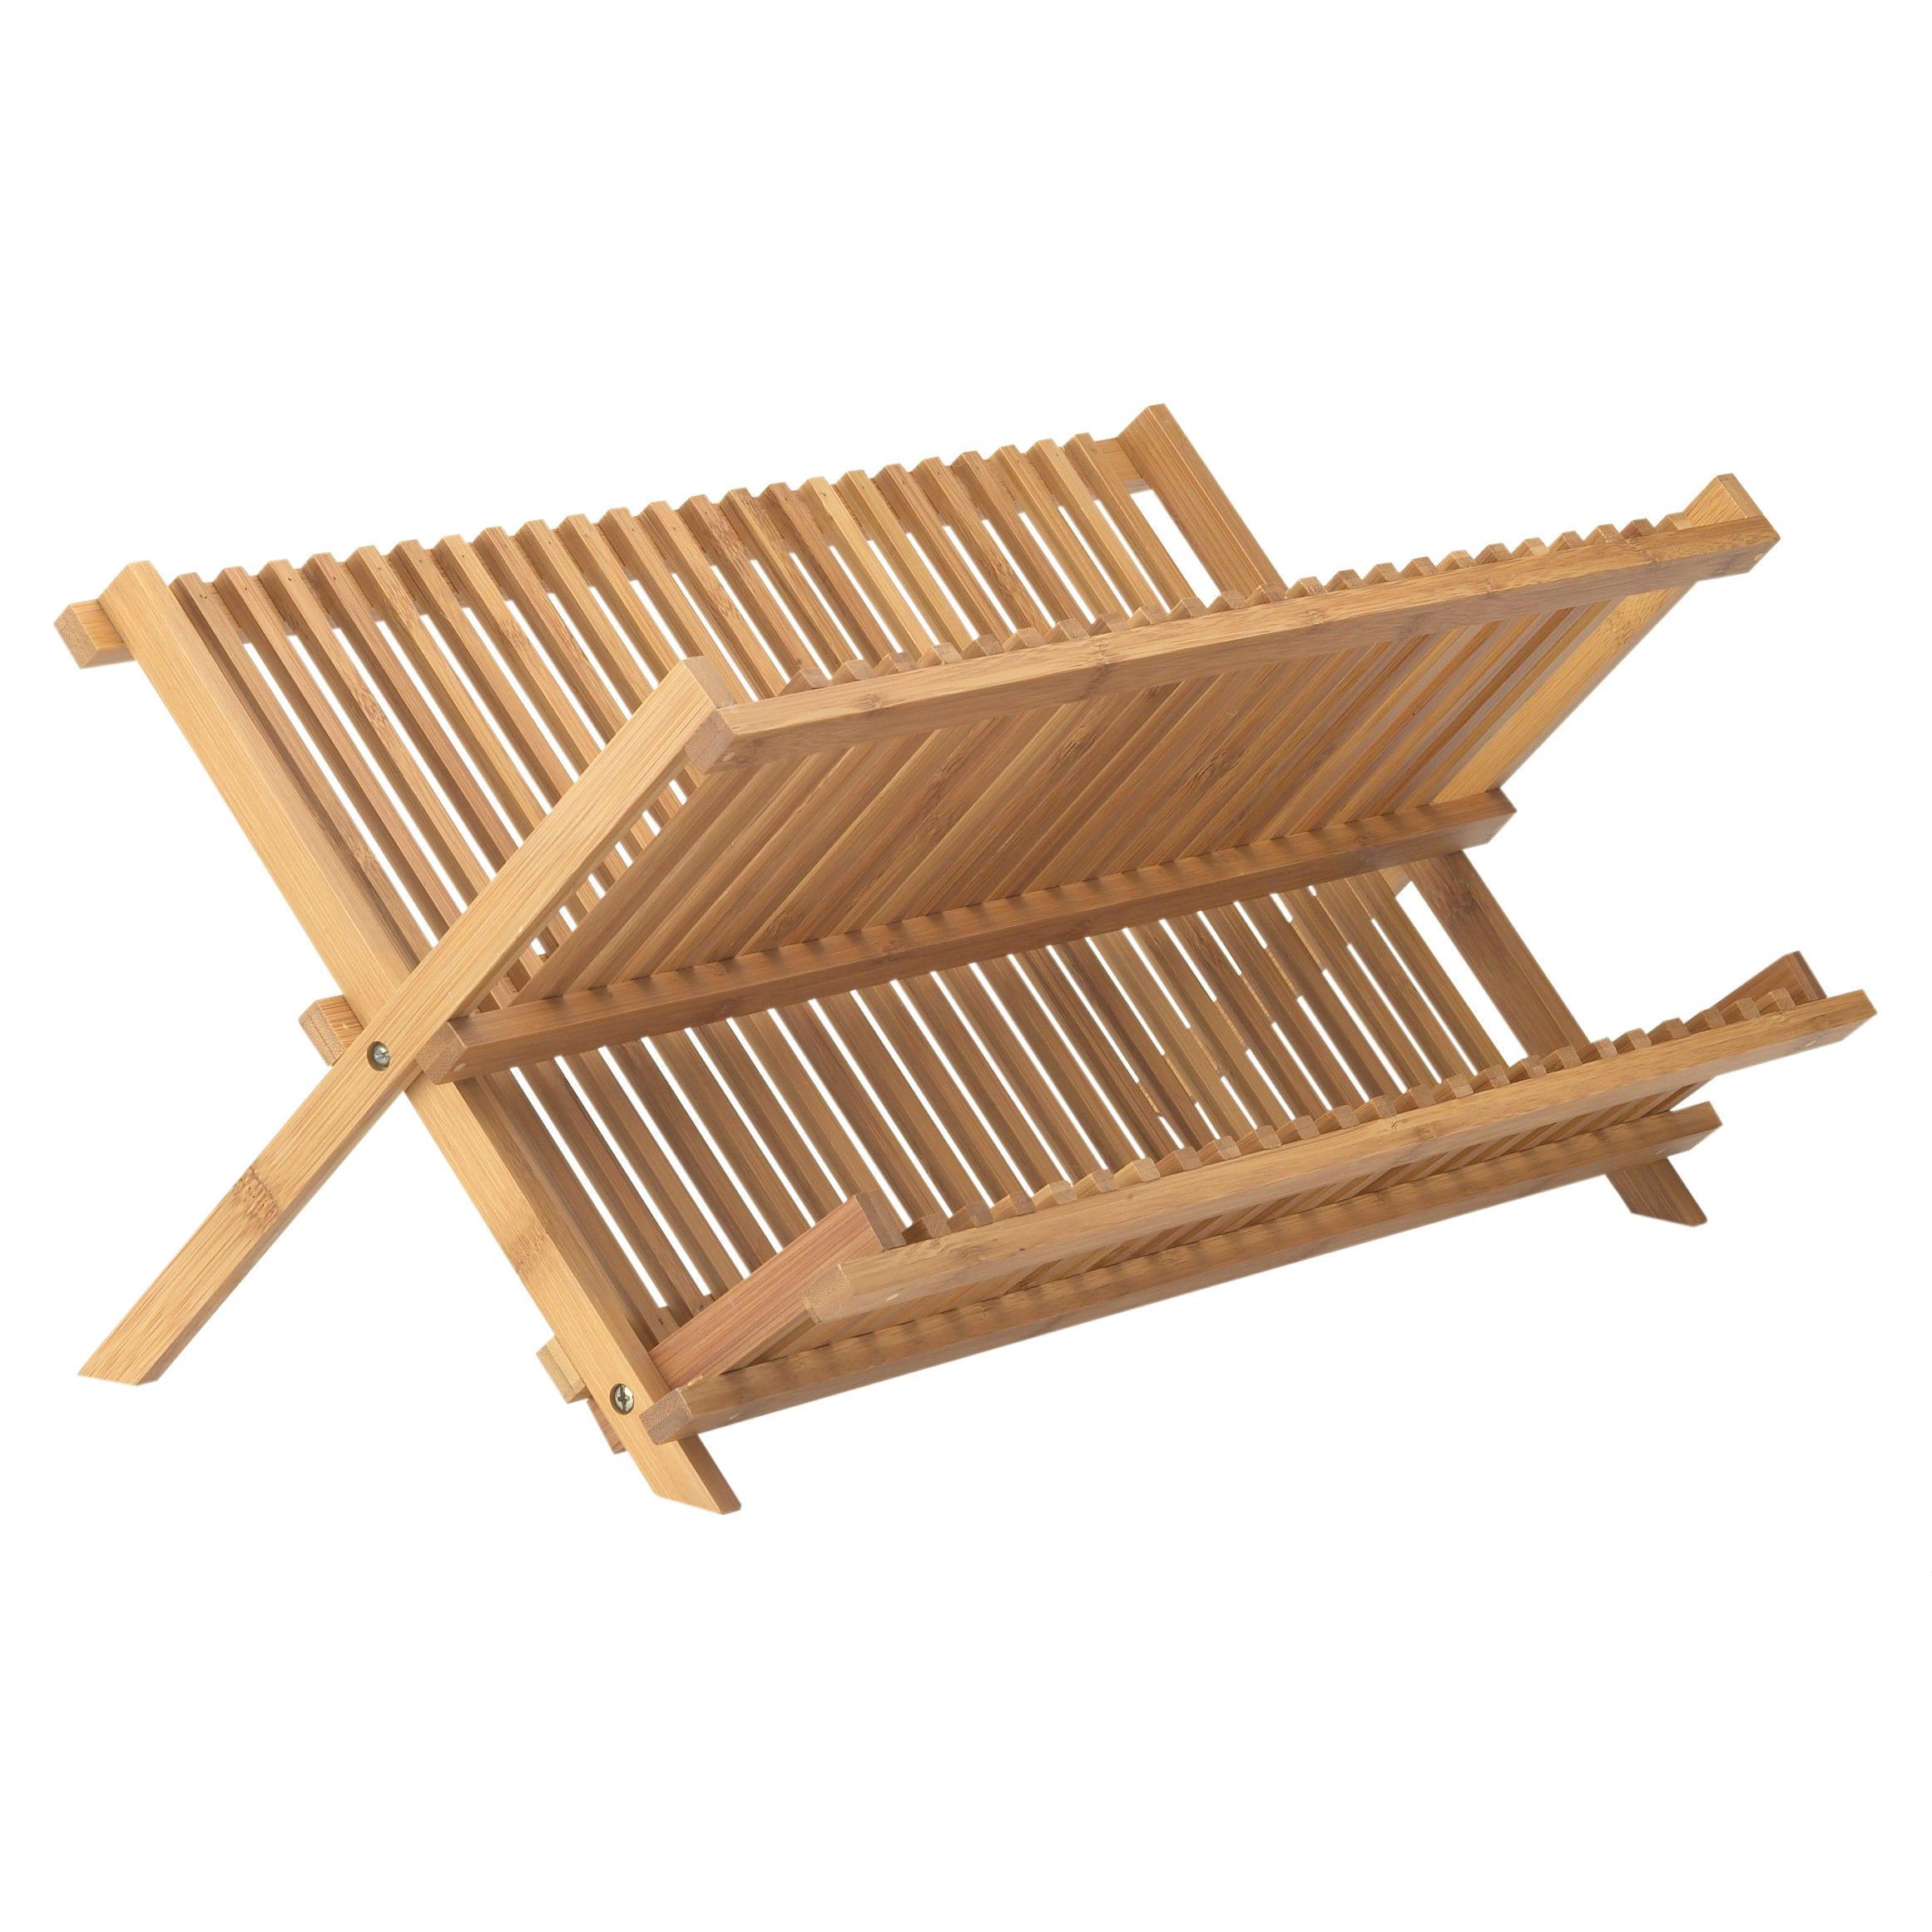 Bamboo (Green) Dish Drying Rack (Brown) (Wood)